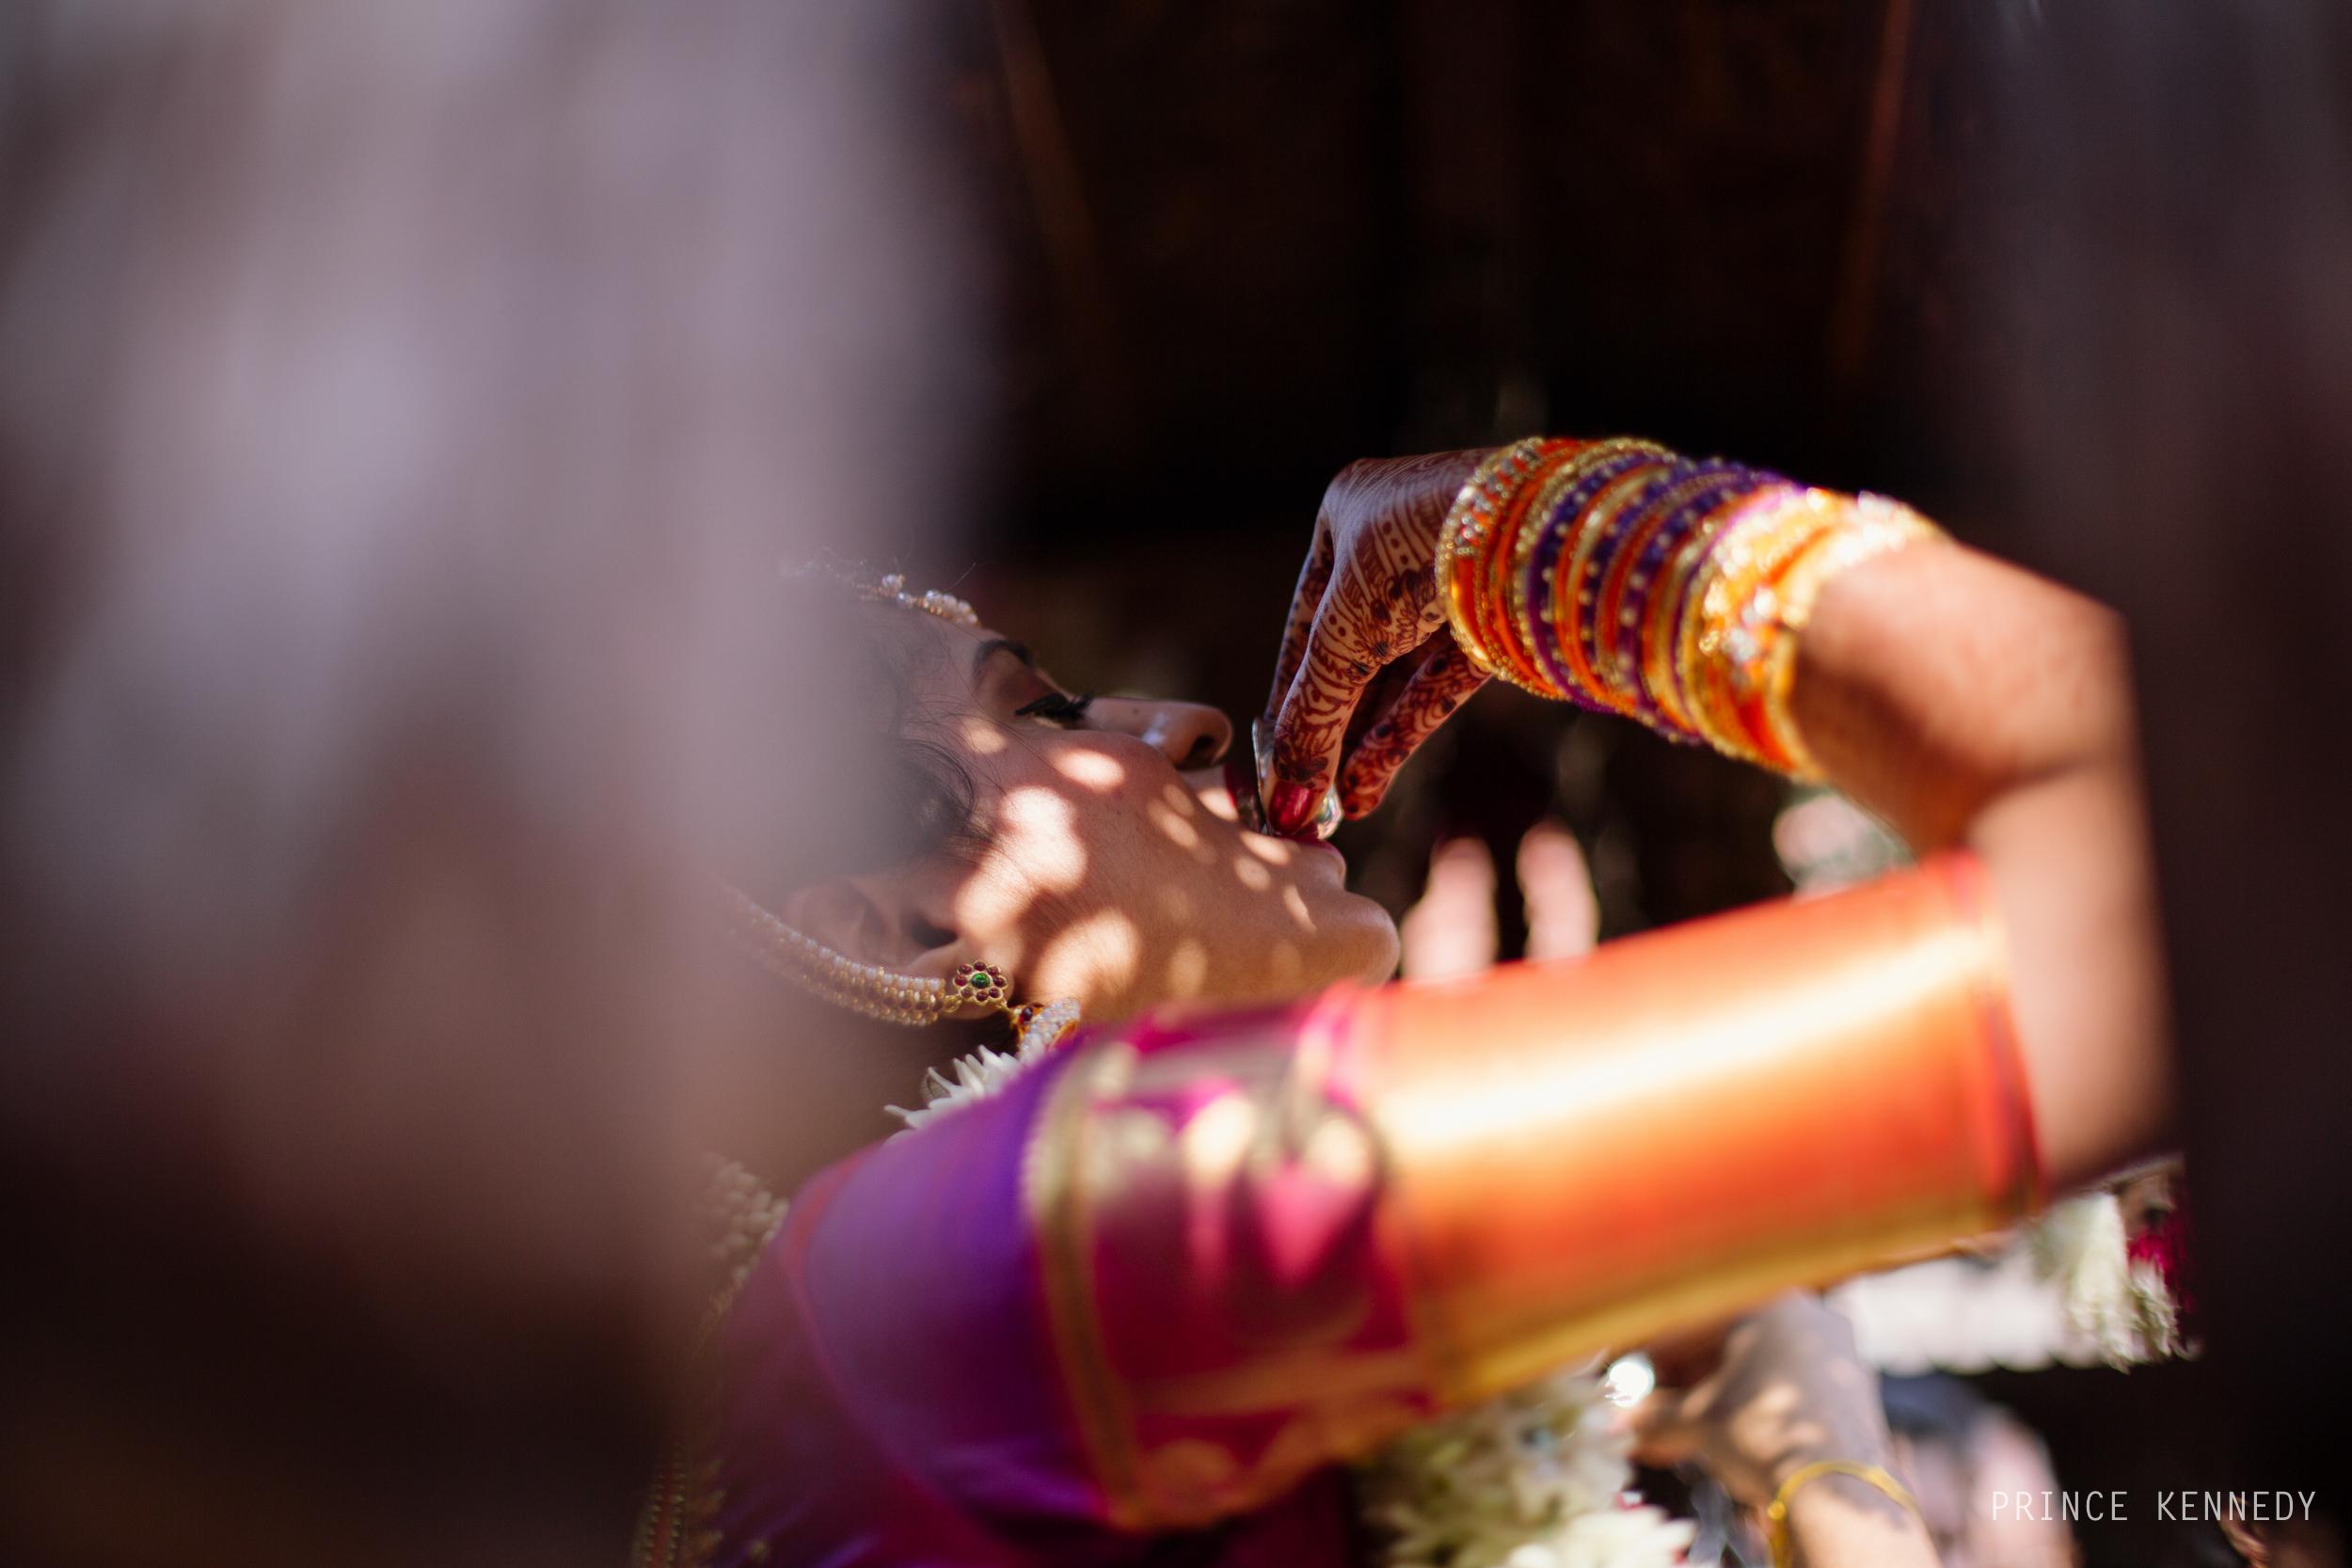 Athmajja-Nithesh-Engagement-Couple-Portrait-Portraiture-Wedding-Couple-Portrait-Chennai-Photographer-Candid-Photography-Destination-Best-Prince-Kennedy-Photography-157.jpg